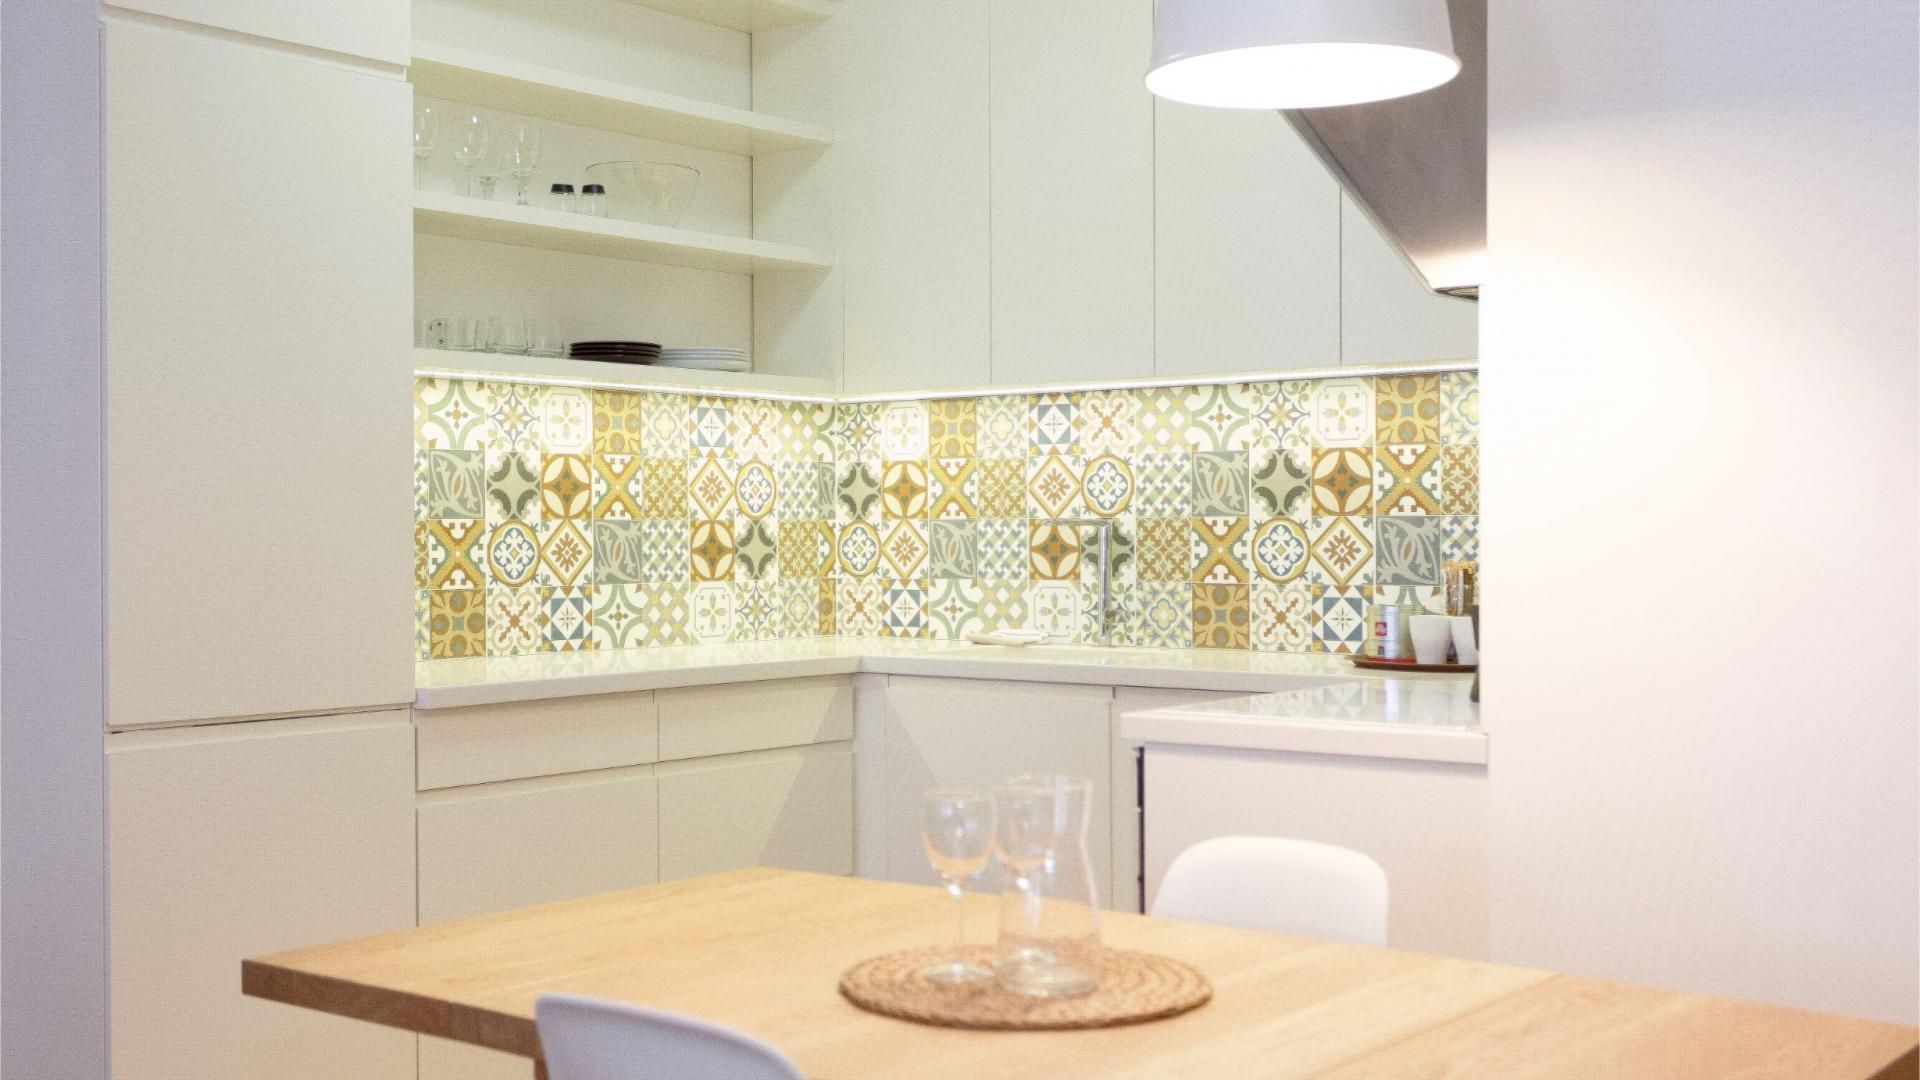 Kitchen facilities at Siauliu Town Hall Apartment